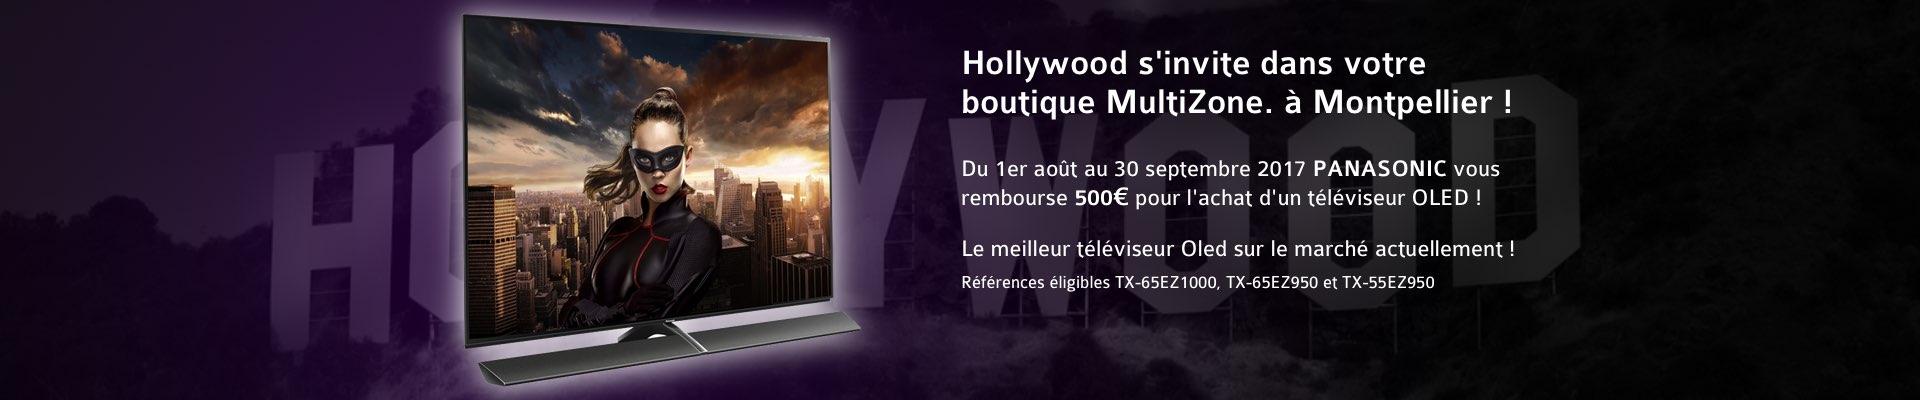 slide-pana-500-euros